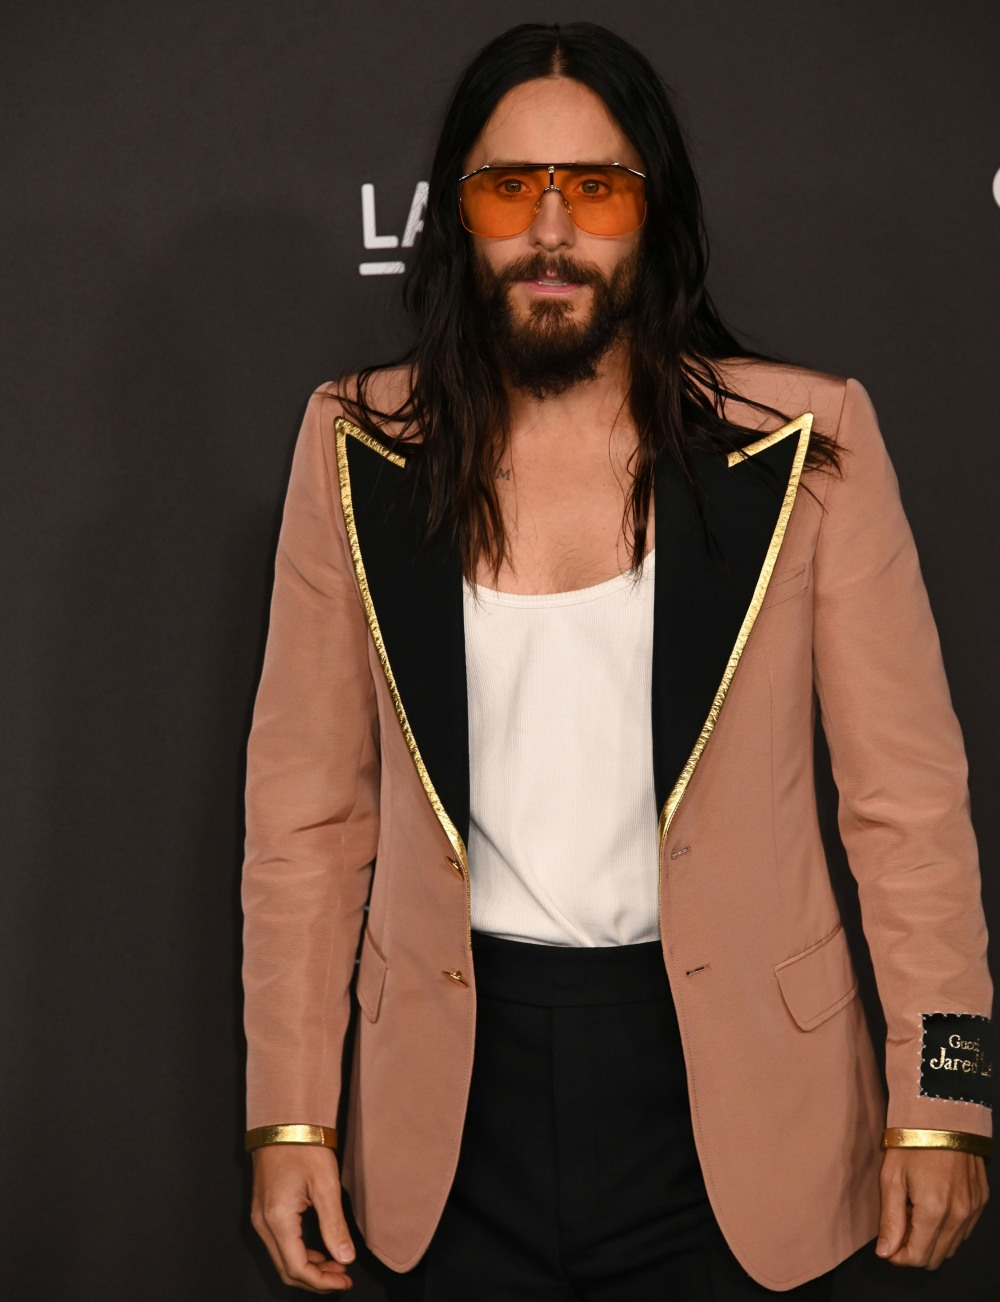 Jared Leto attends the 2019 LACMA Art + Film Gala at LACMA on November 02, 2019 in Los Angeles, California © J Graylock/jpistudios.com